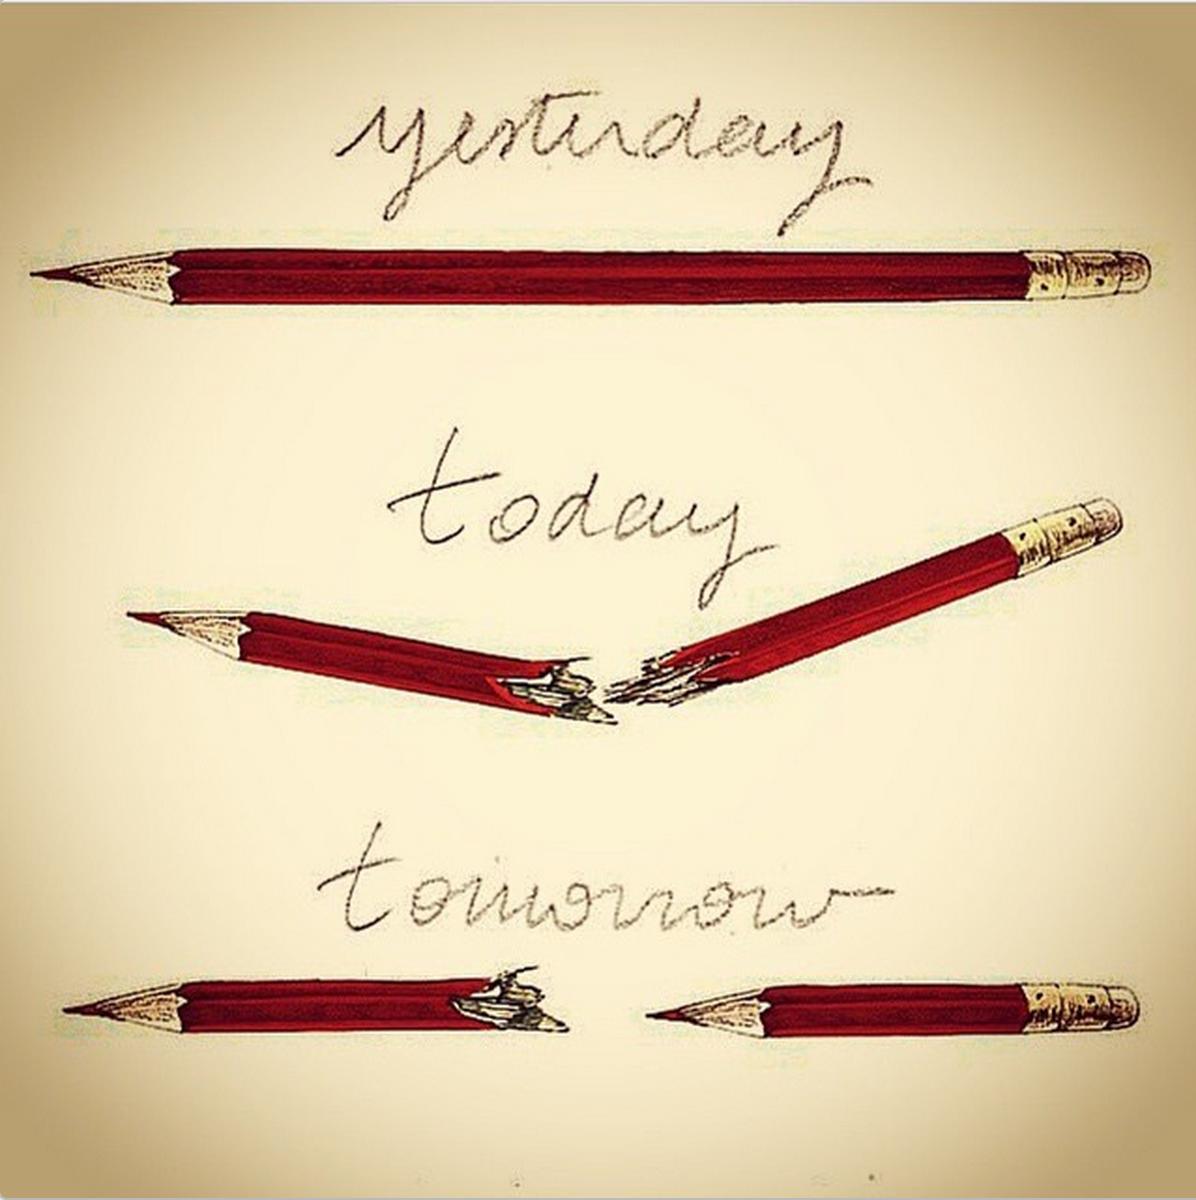 What @BanksyOfficiaI said! http://t.co/ITE4ESCO4Q #JeSuisCharlie http://t.co/pg2epmjuTu